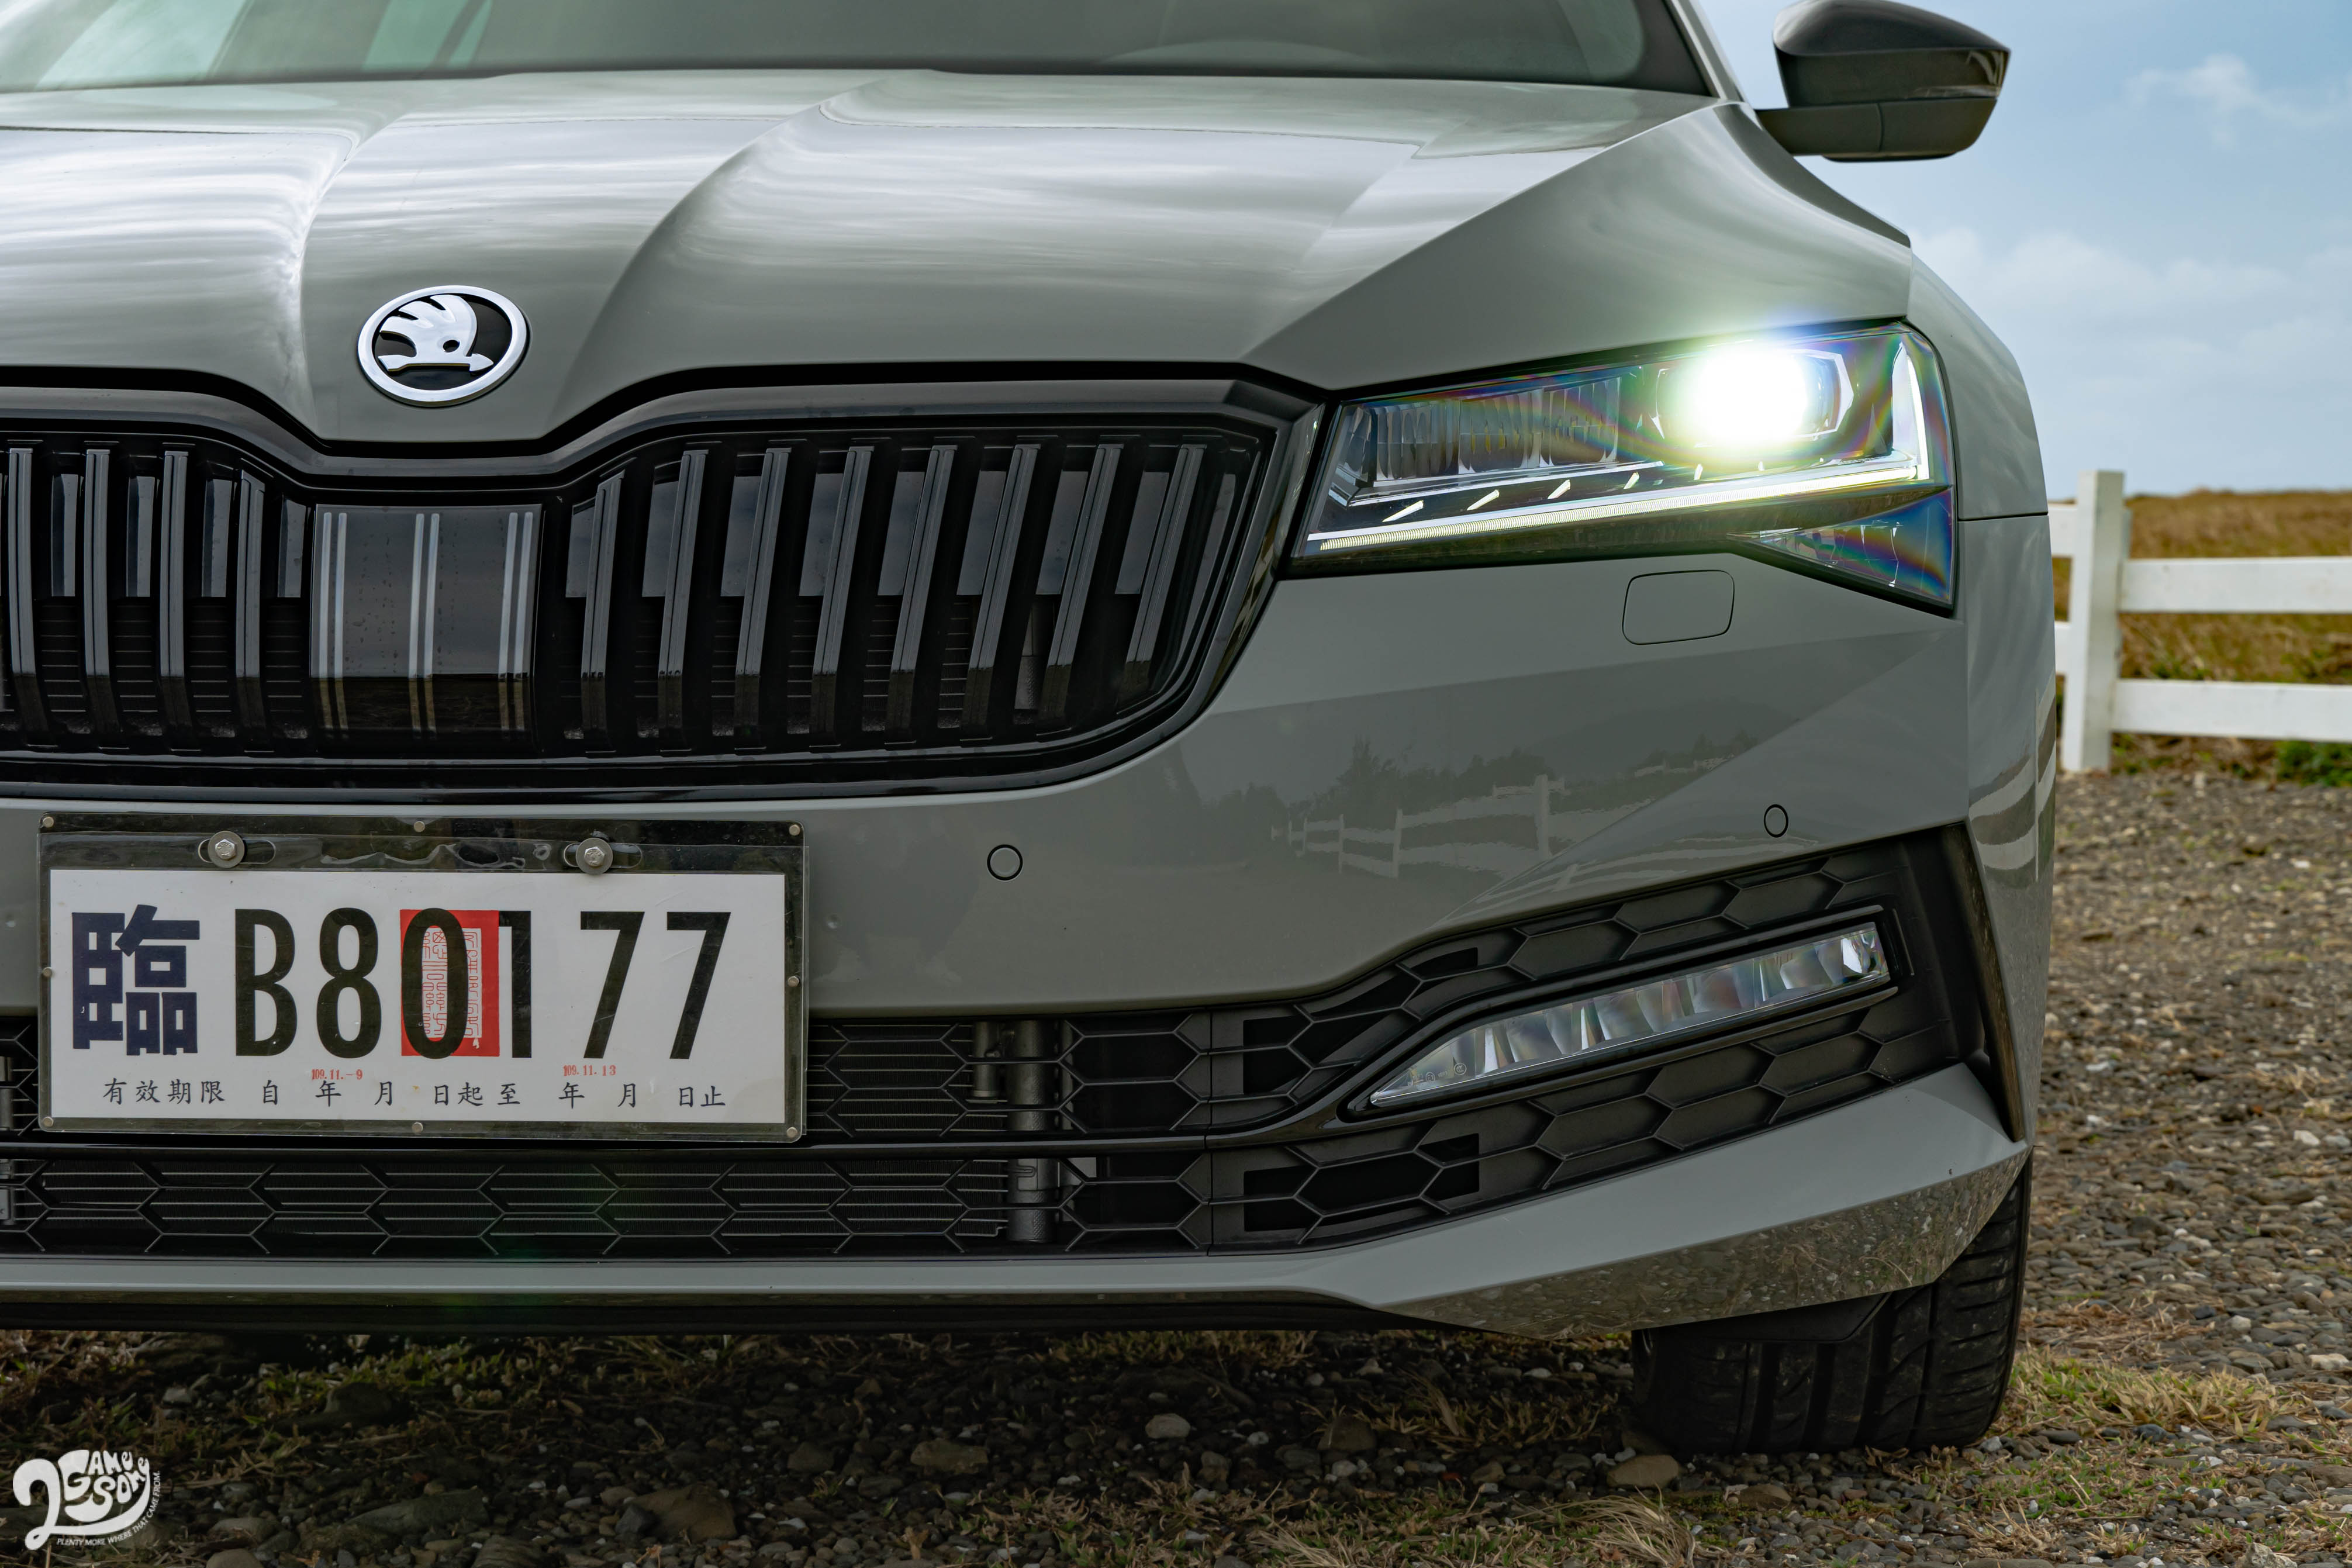 Matrix LED 智慧蜂巢式前保桿複眼頭燈組在年底前全車系都免費升級。